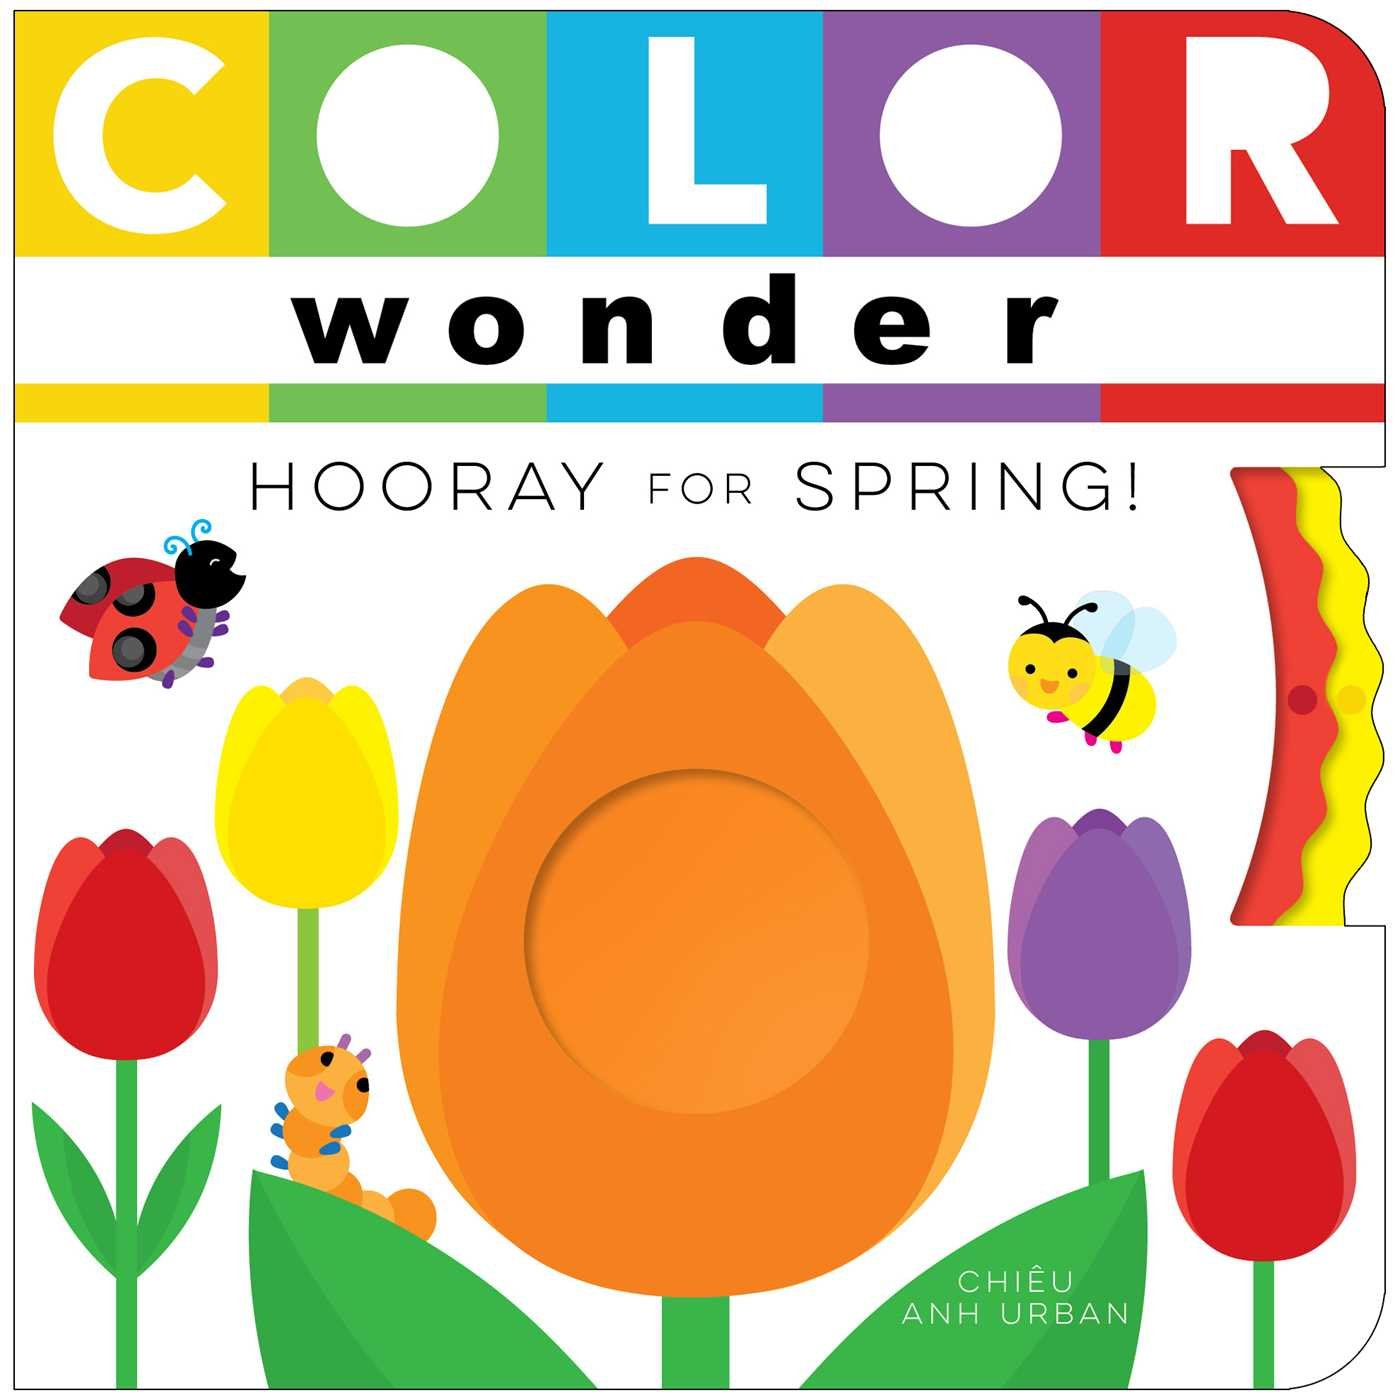 amazoncom color wonder hooray for spring 9781481487207 chieu anh urban books - Color Wonder Books